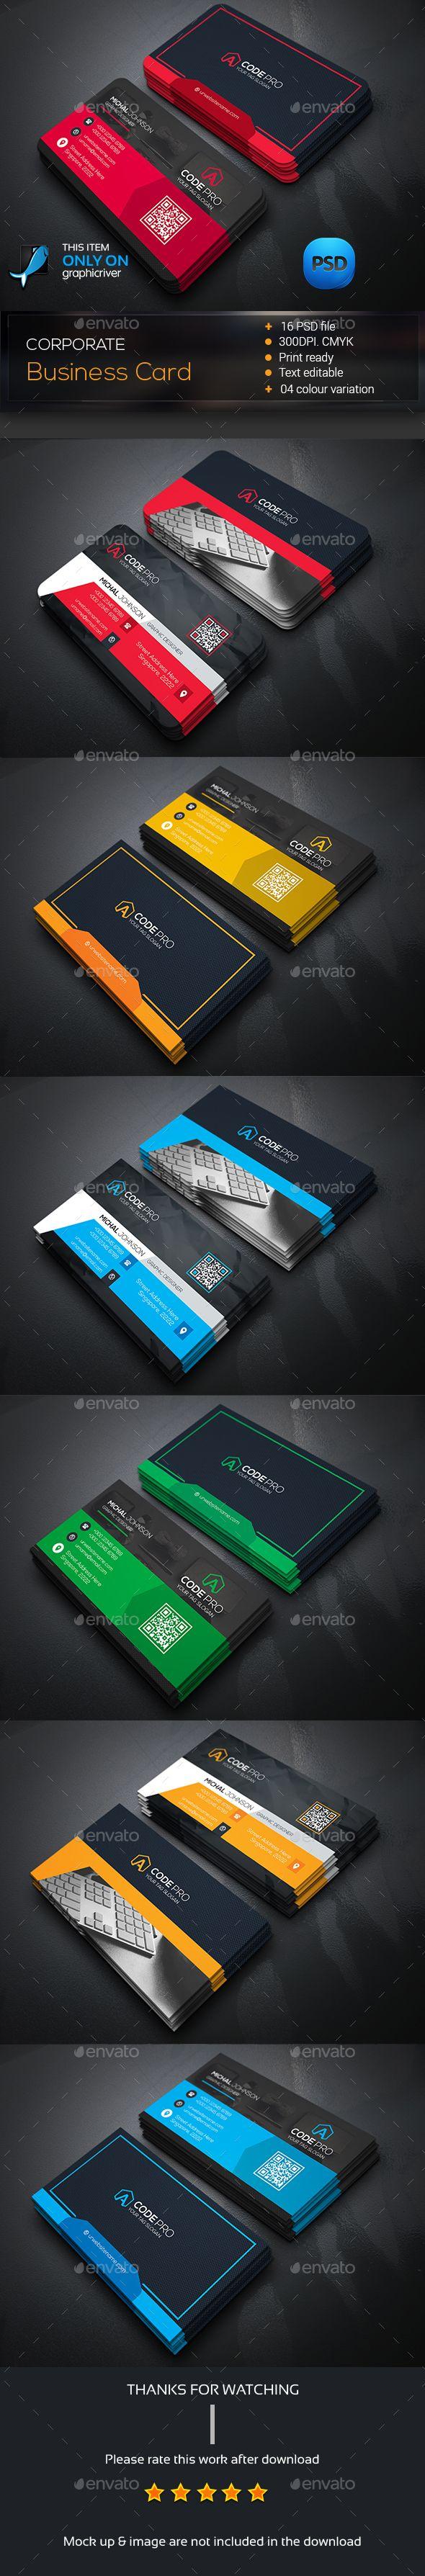 Creative Business Card Template PSD #design Download: http://graphicriver.net/item/creative-business-card/14521047?ref=ksioks